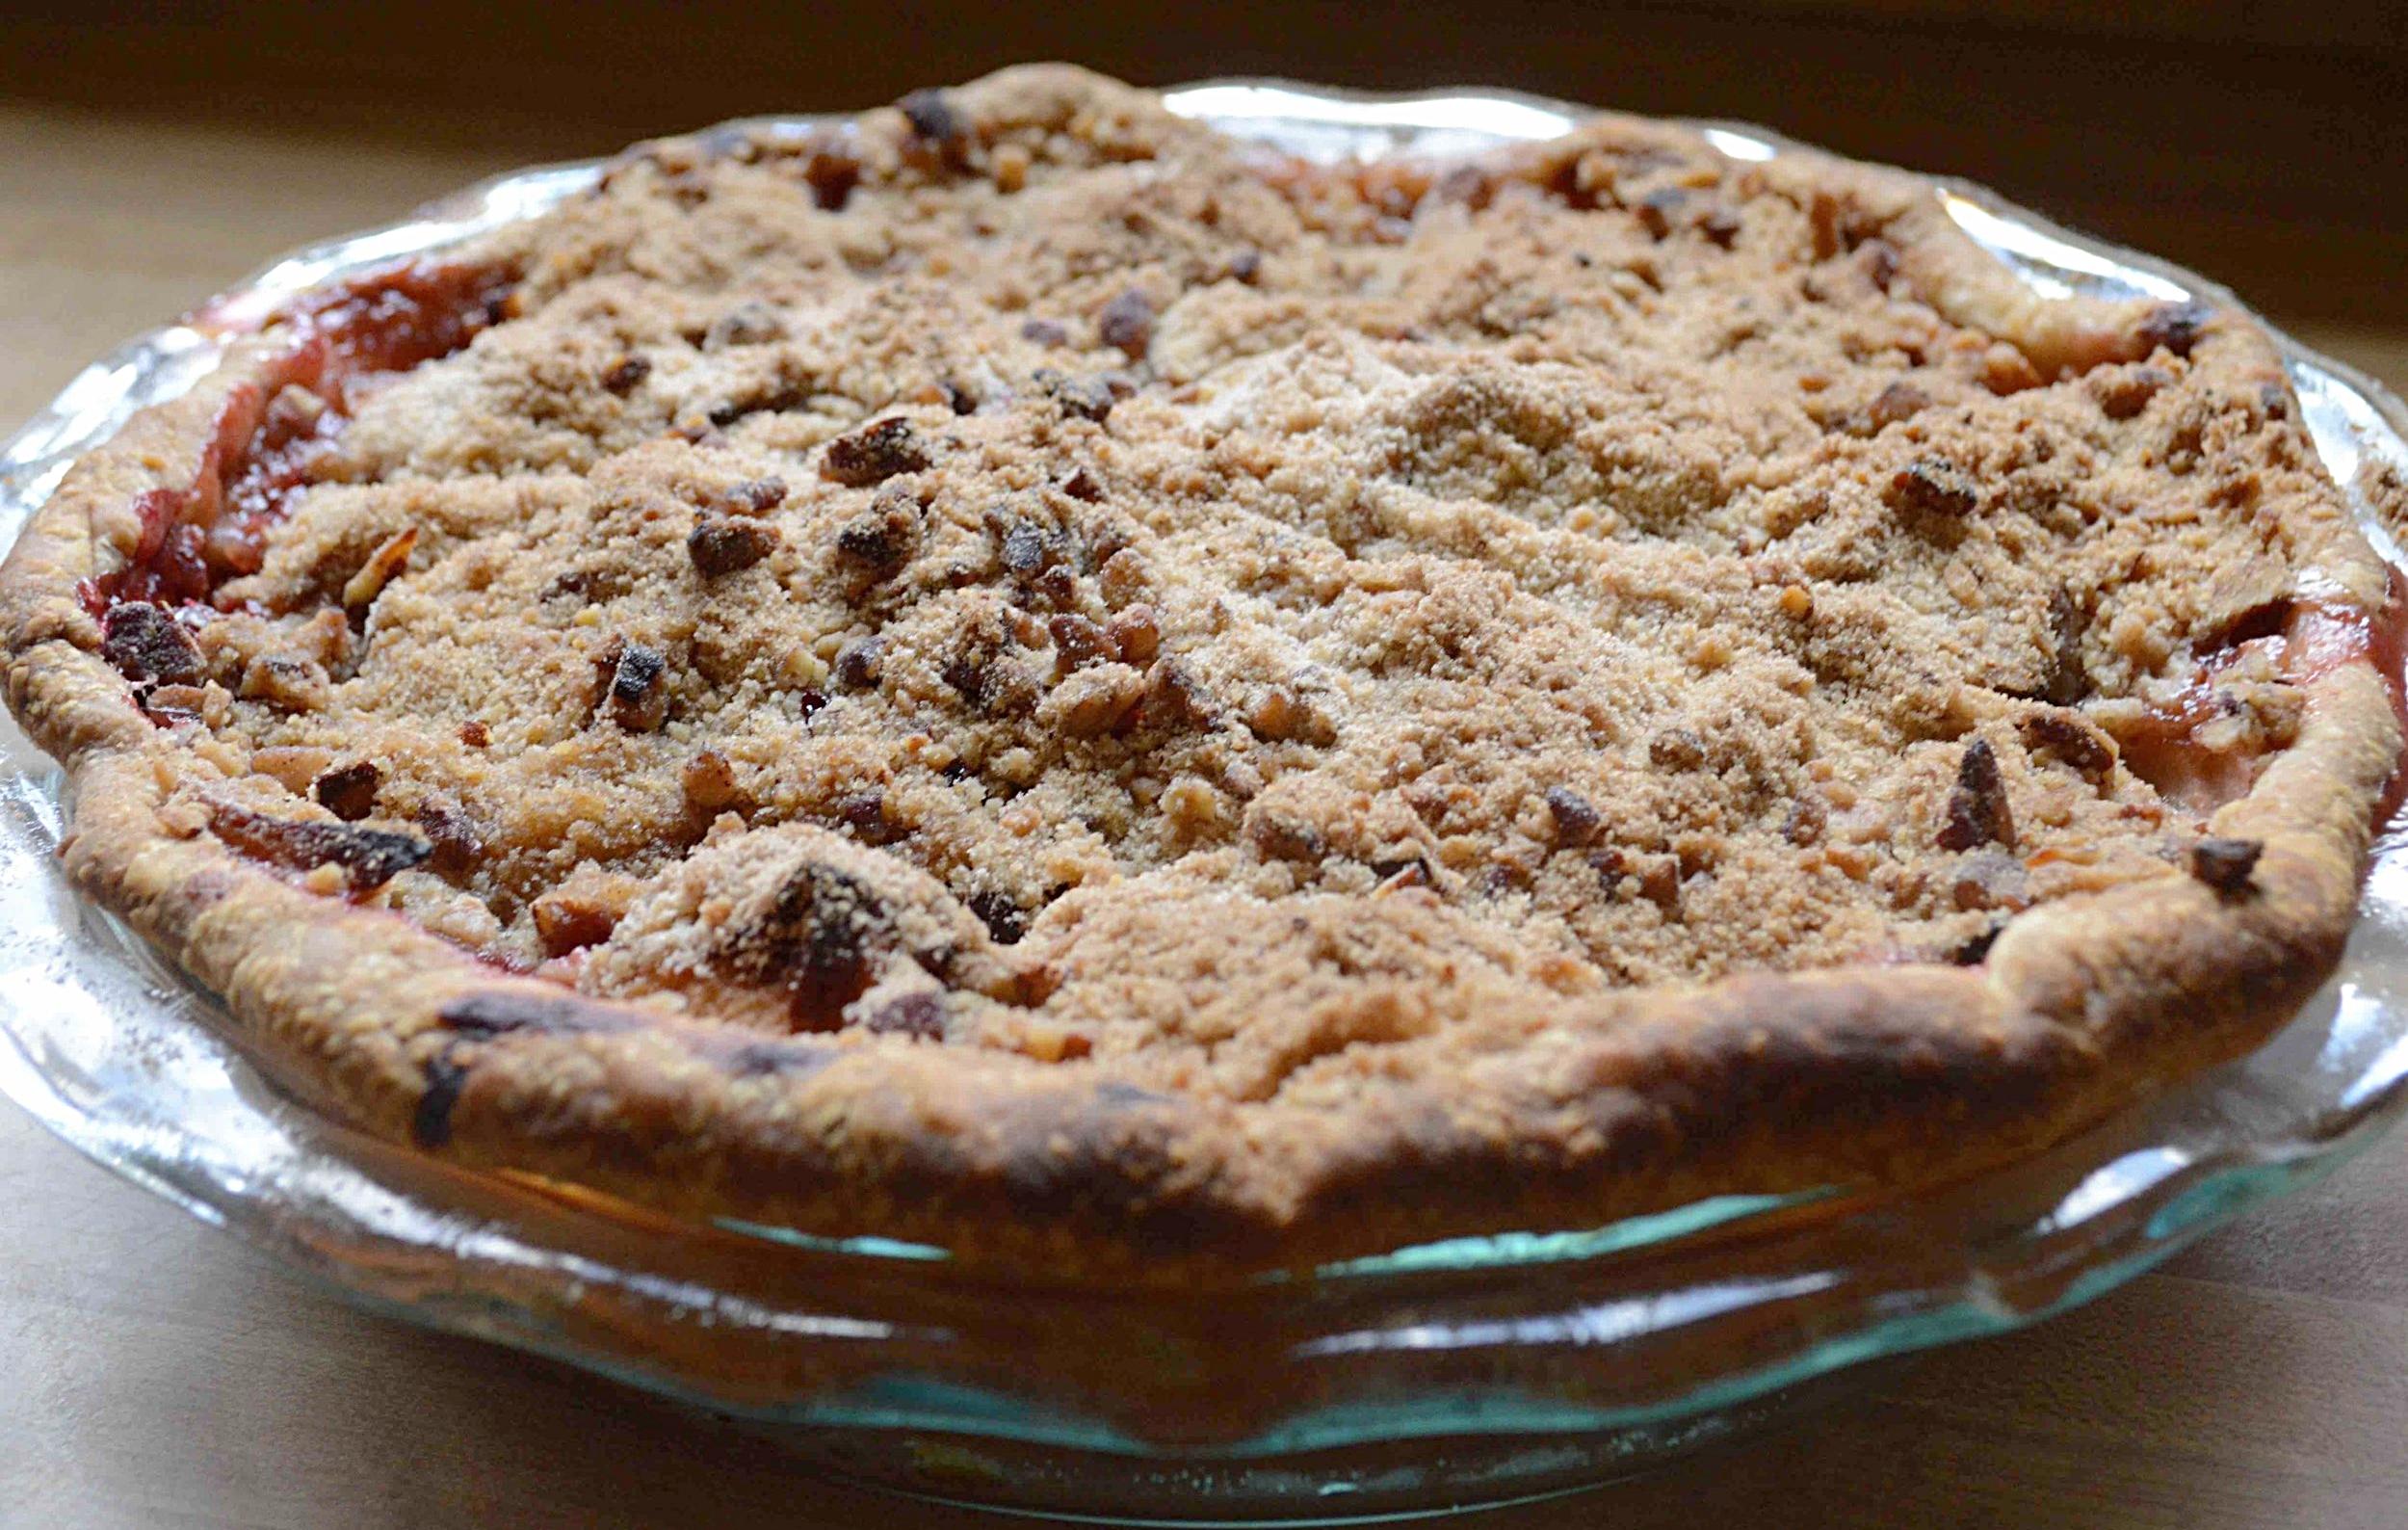 Cranberry-Apple Crumble Pie